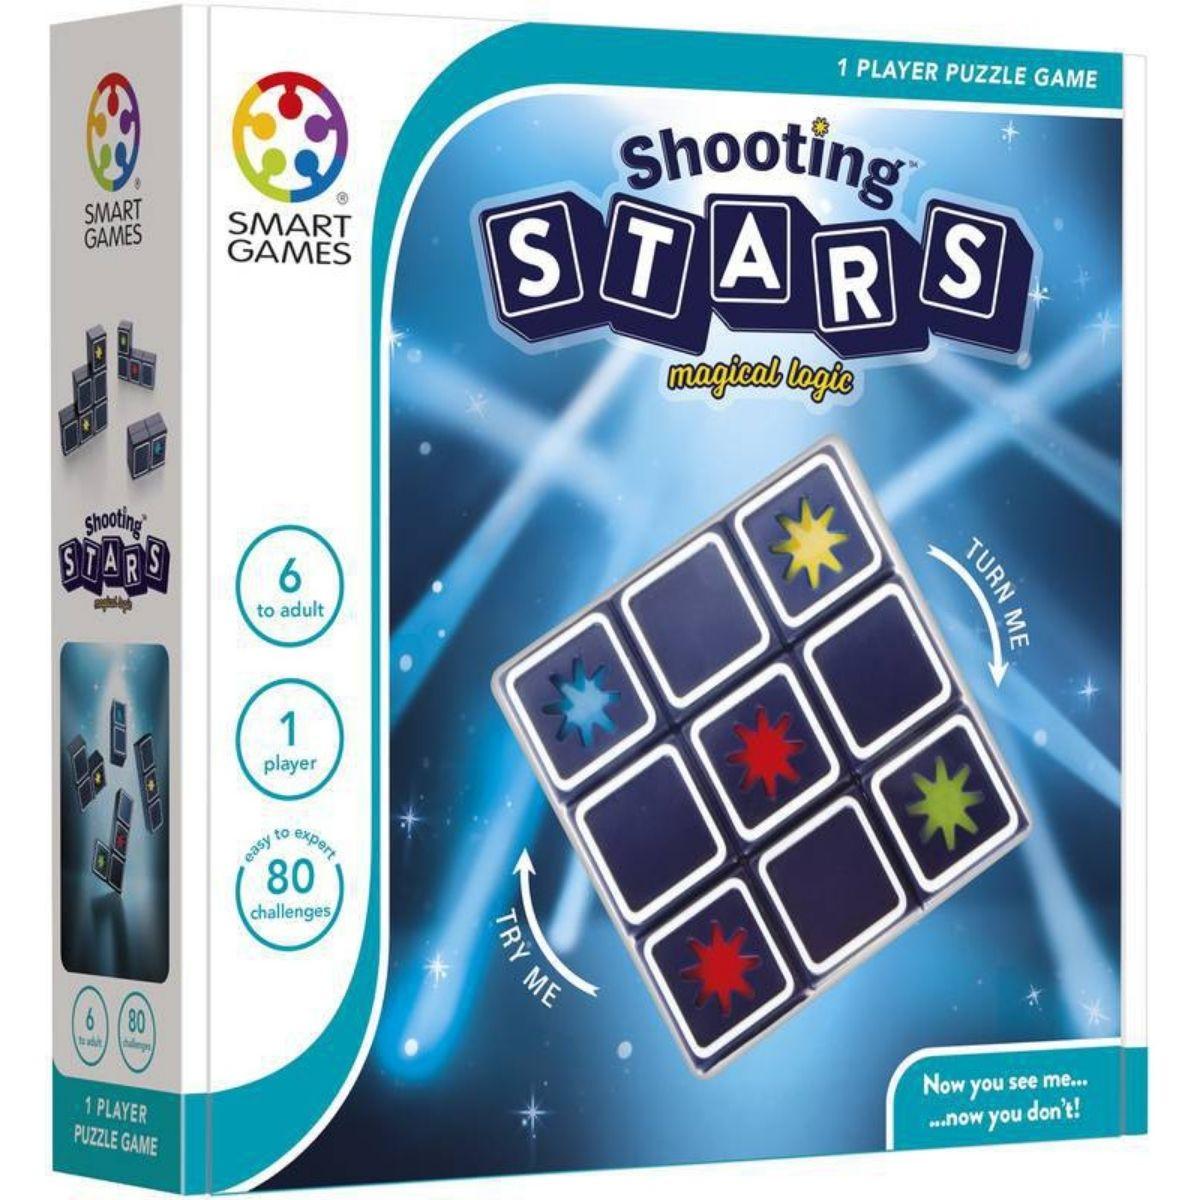 Jogo Tabuleiro Raciocínio Educativo Lúdico Shooting Stars